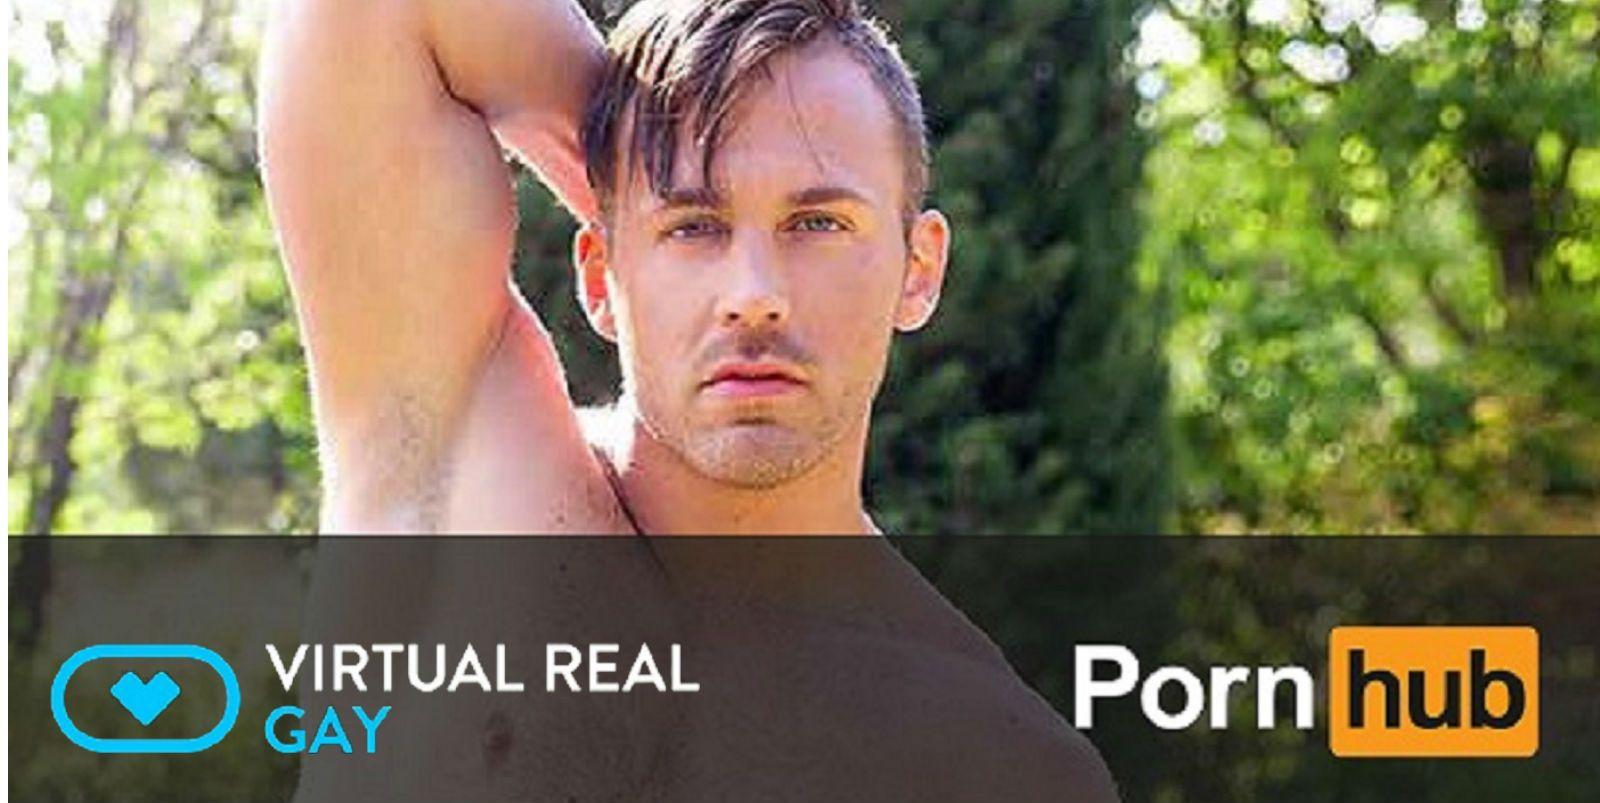 Virtual gay man